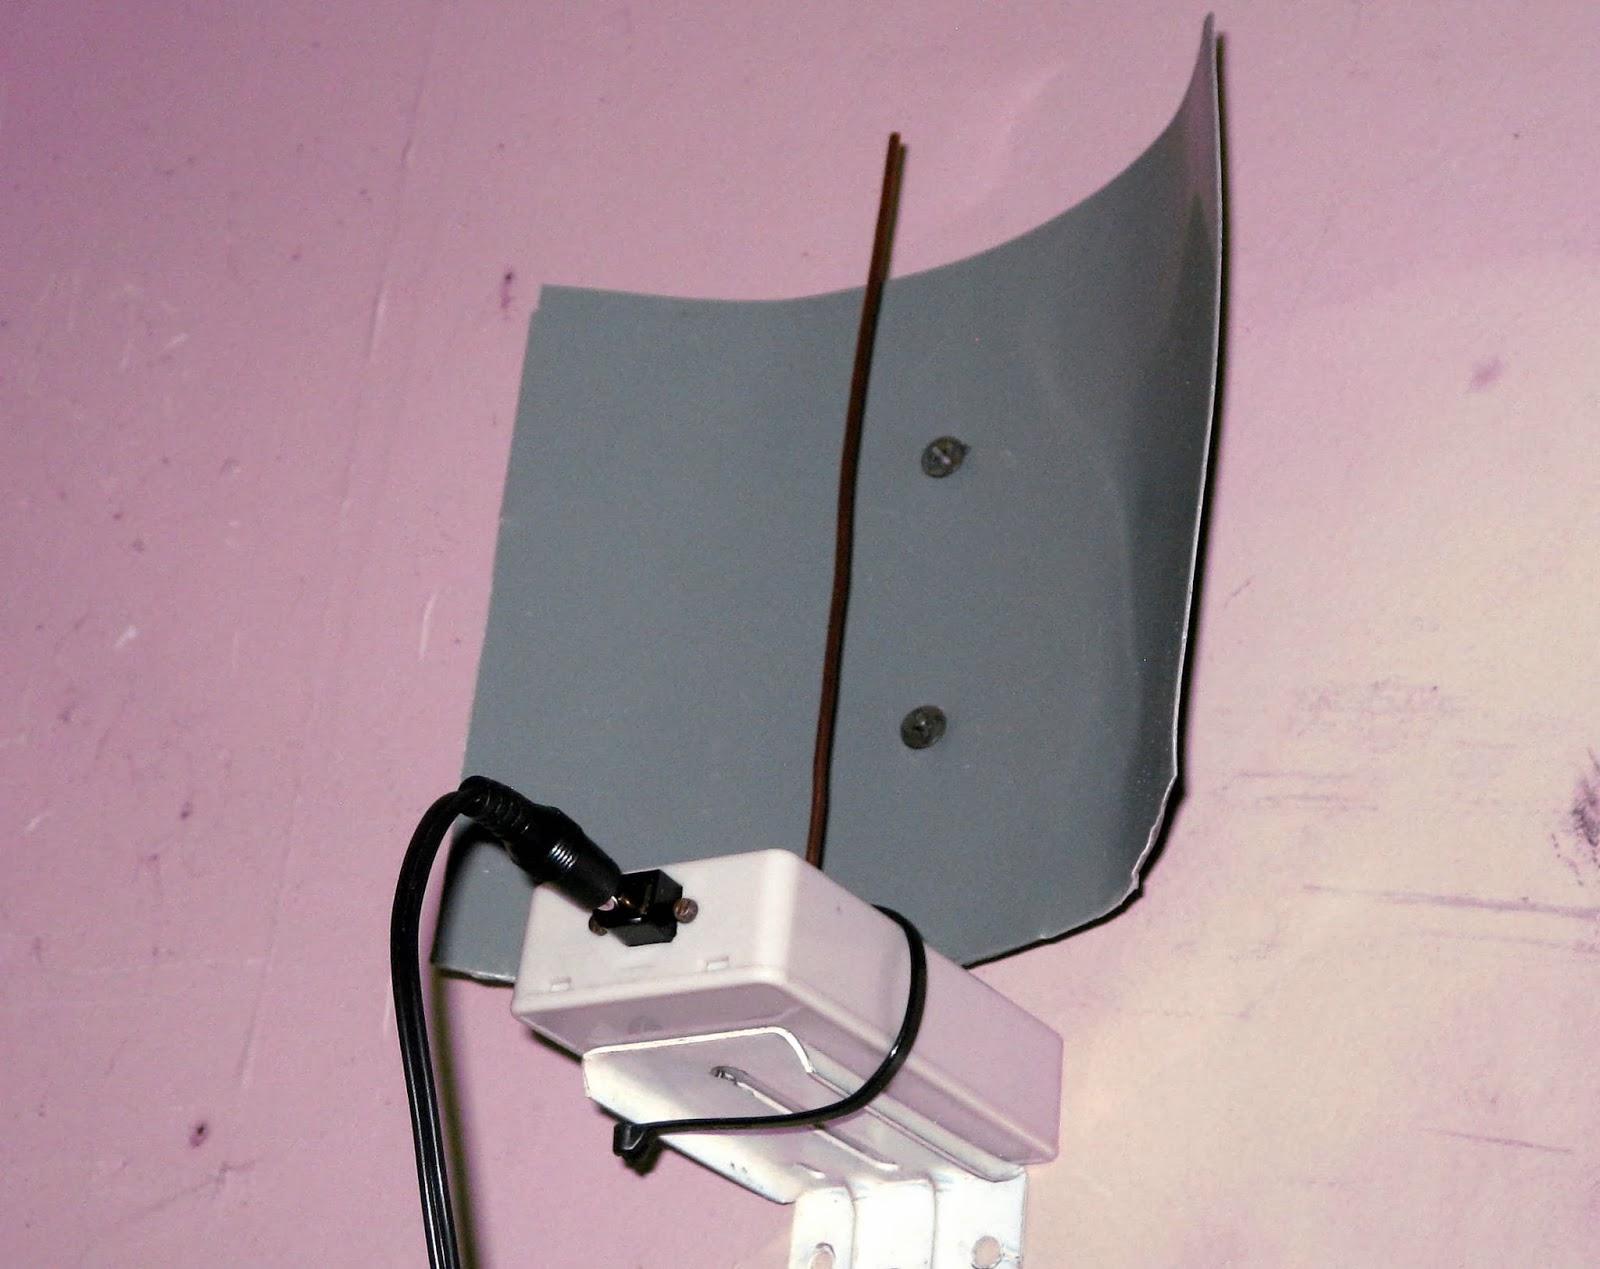 Technocats Techtalk Add A Diy Audible Alert To Motion Sensing Flood Light Wiring Instructions Installing Remote Detector 433 Mhz Sensor Sending Unit